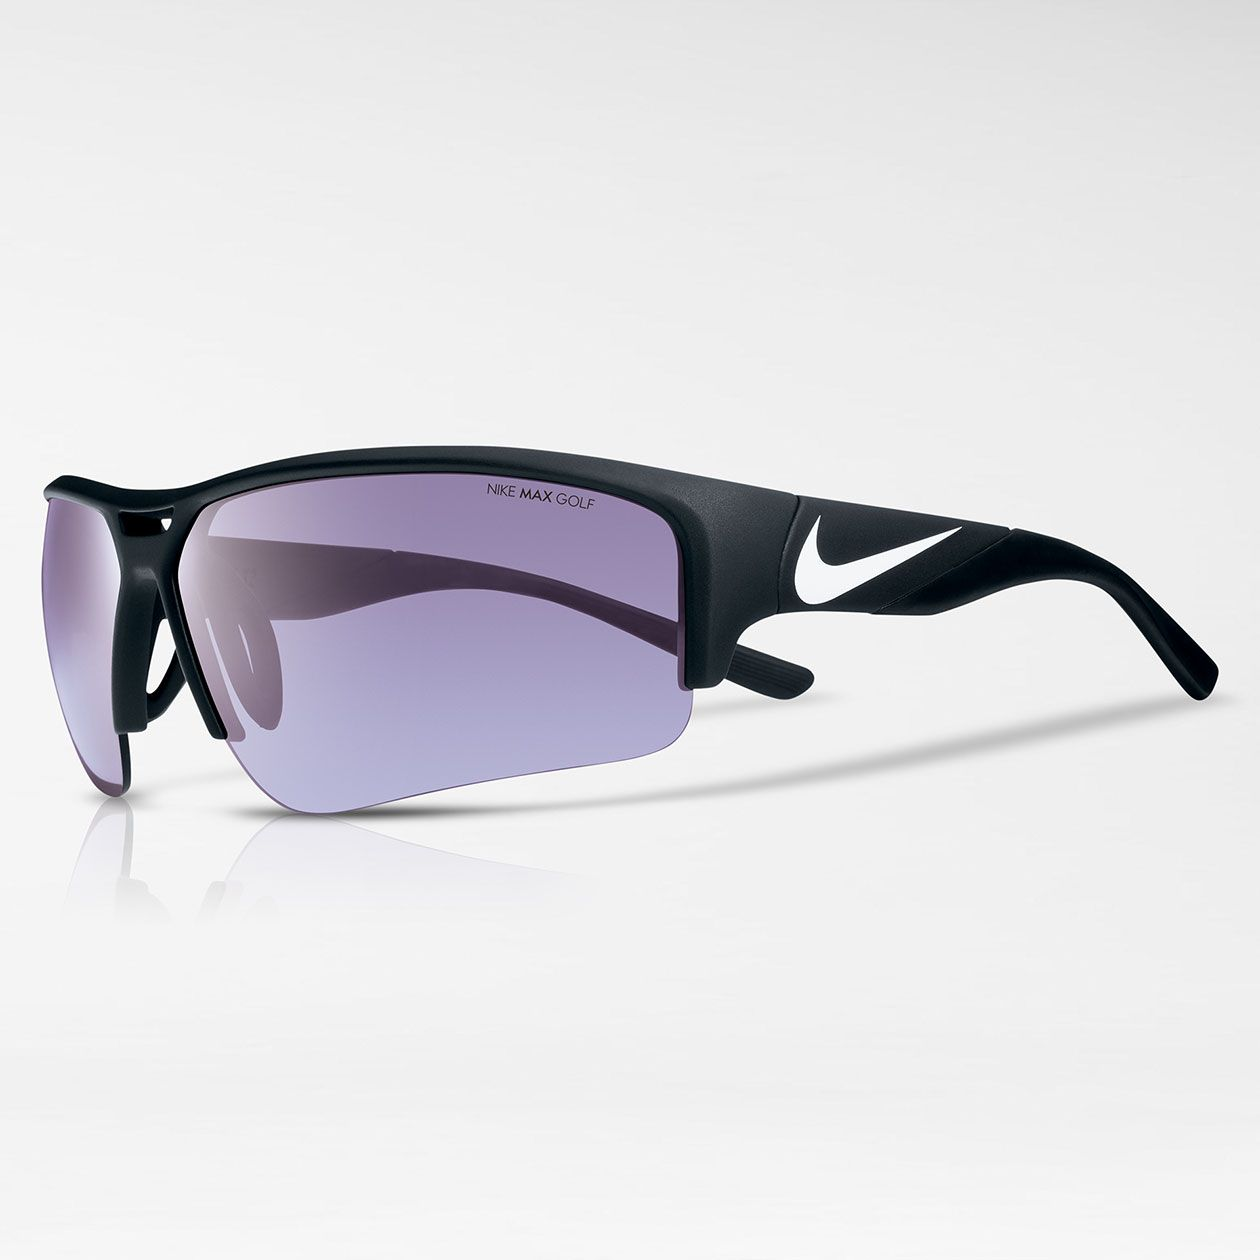 Nike Golf X2 Pro Nike Vision Sports glasses eyewear